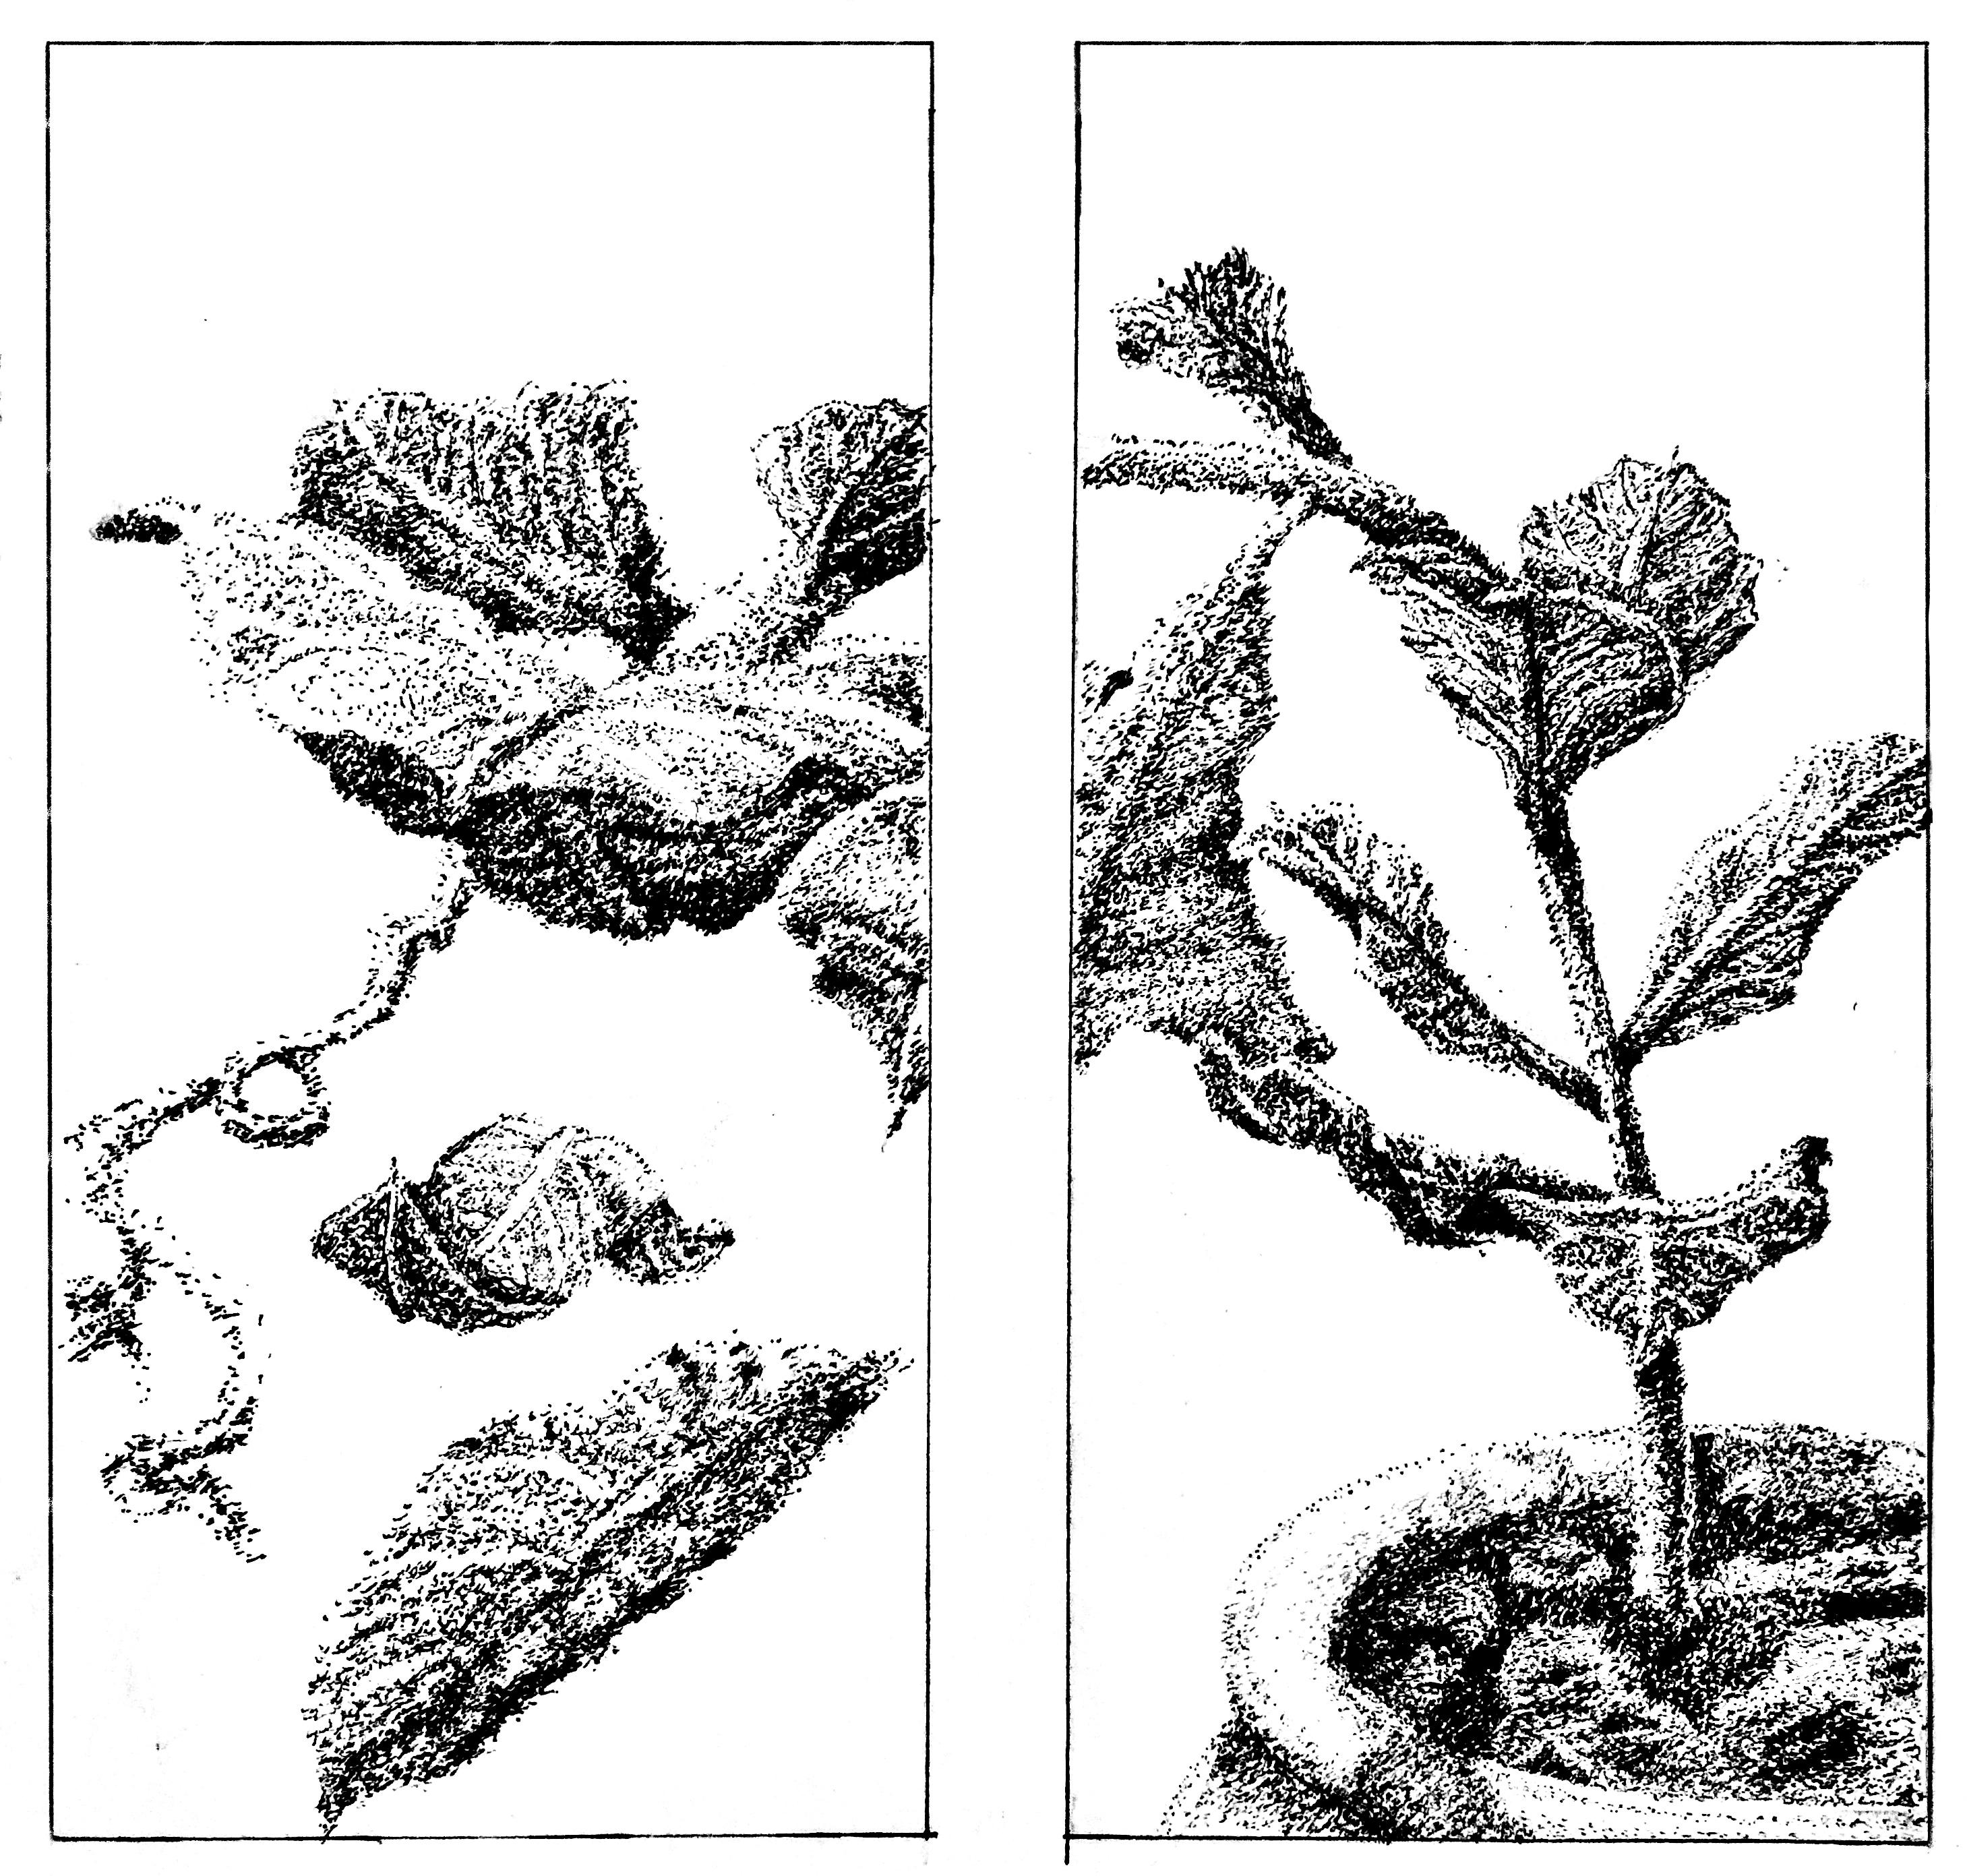 Mahmoud - Wilting Foliage